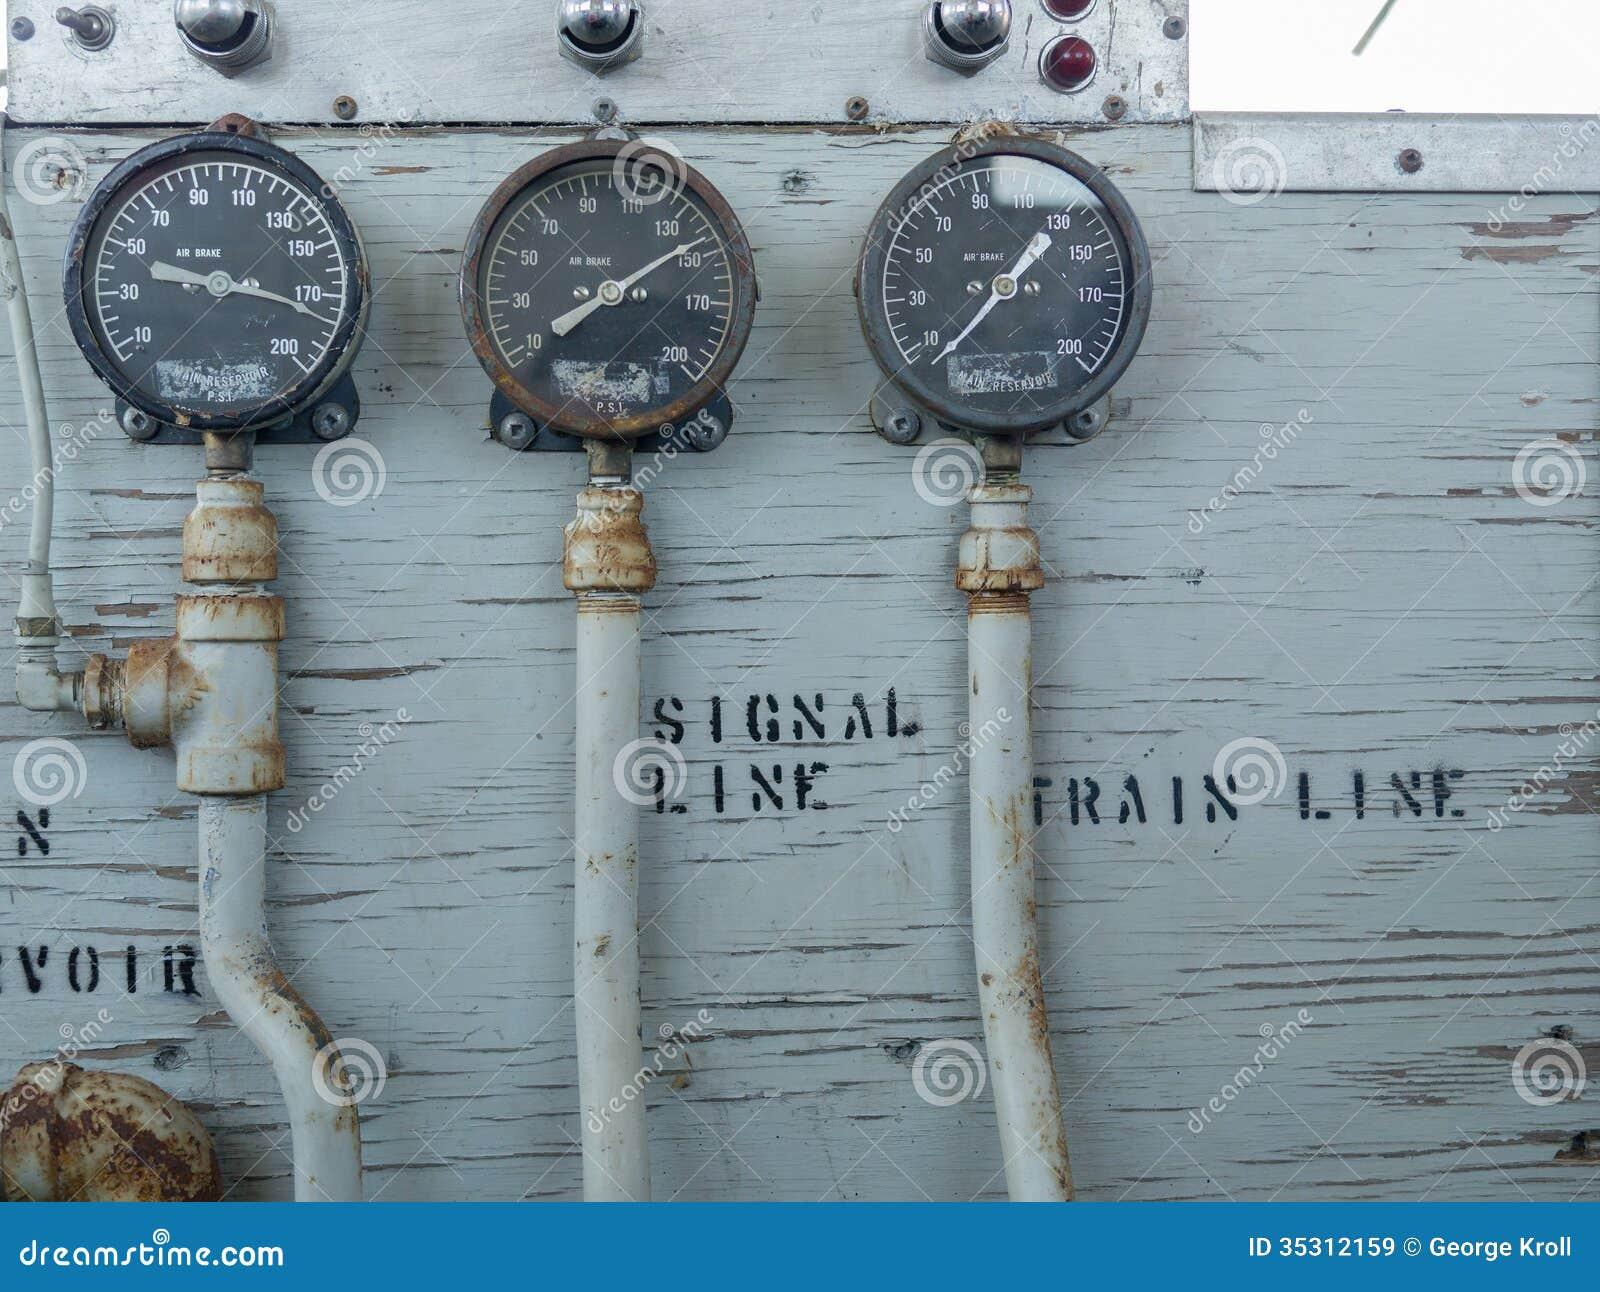 Train air brake guages stock image of